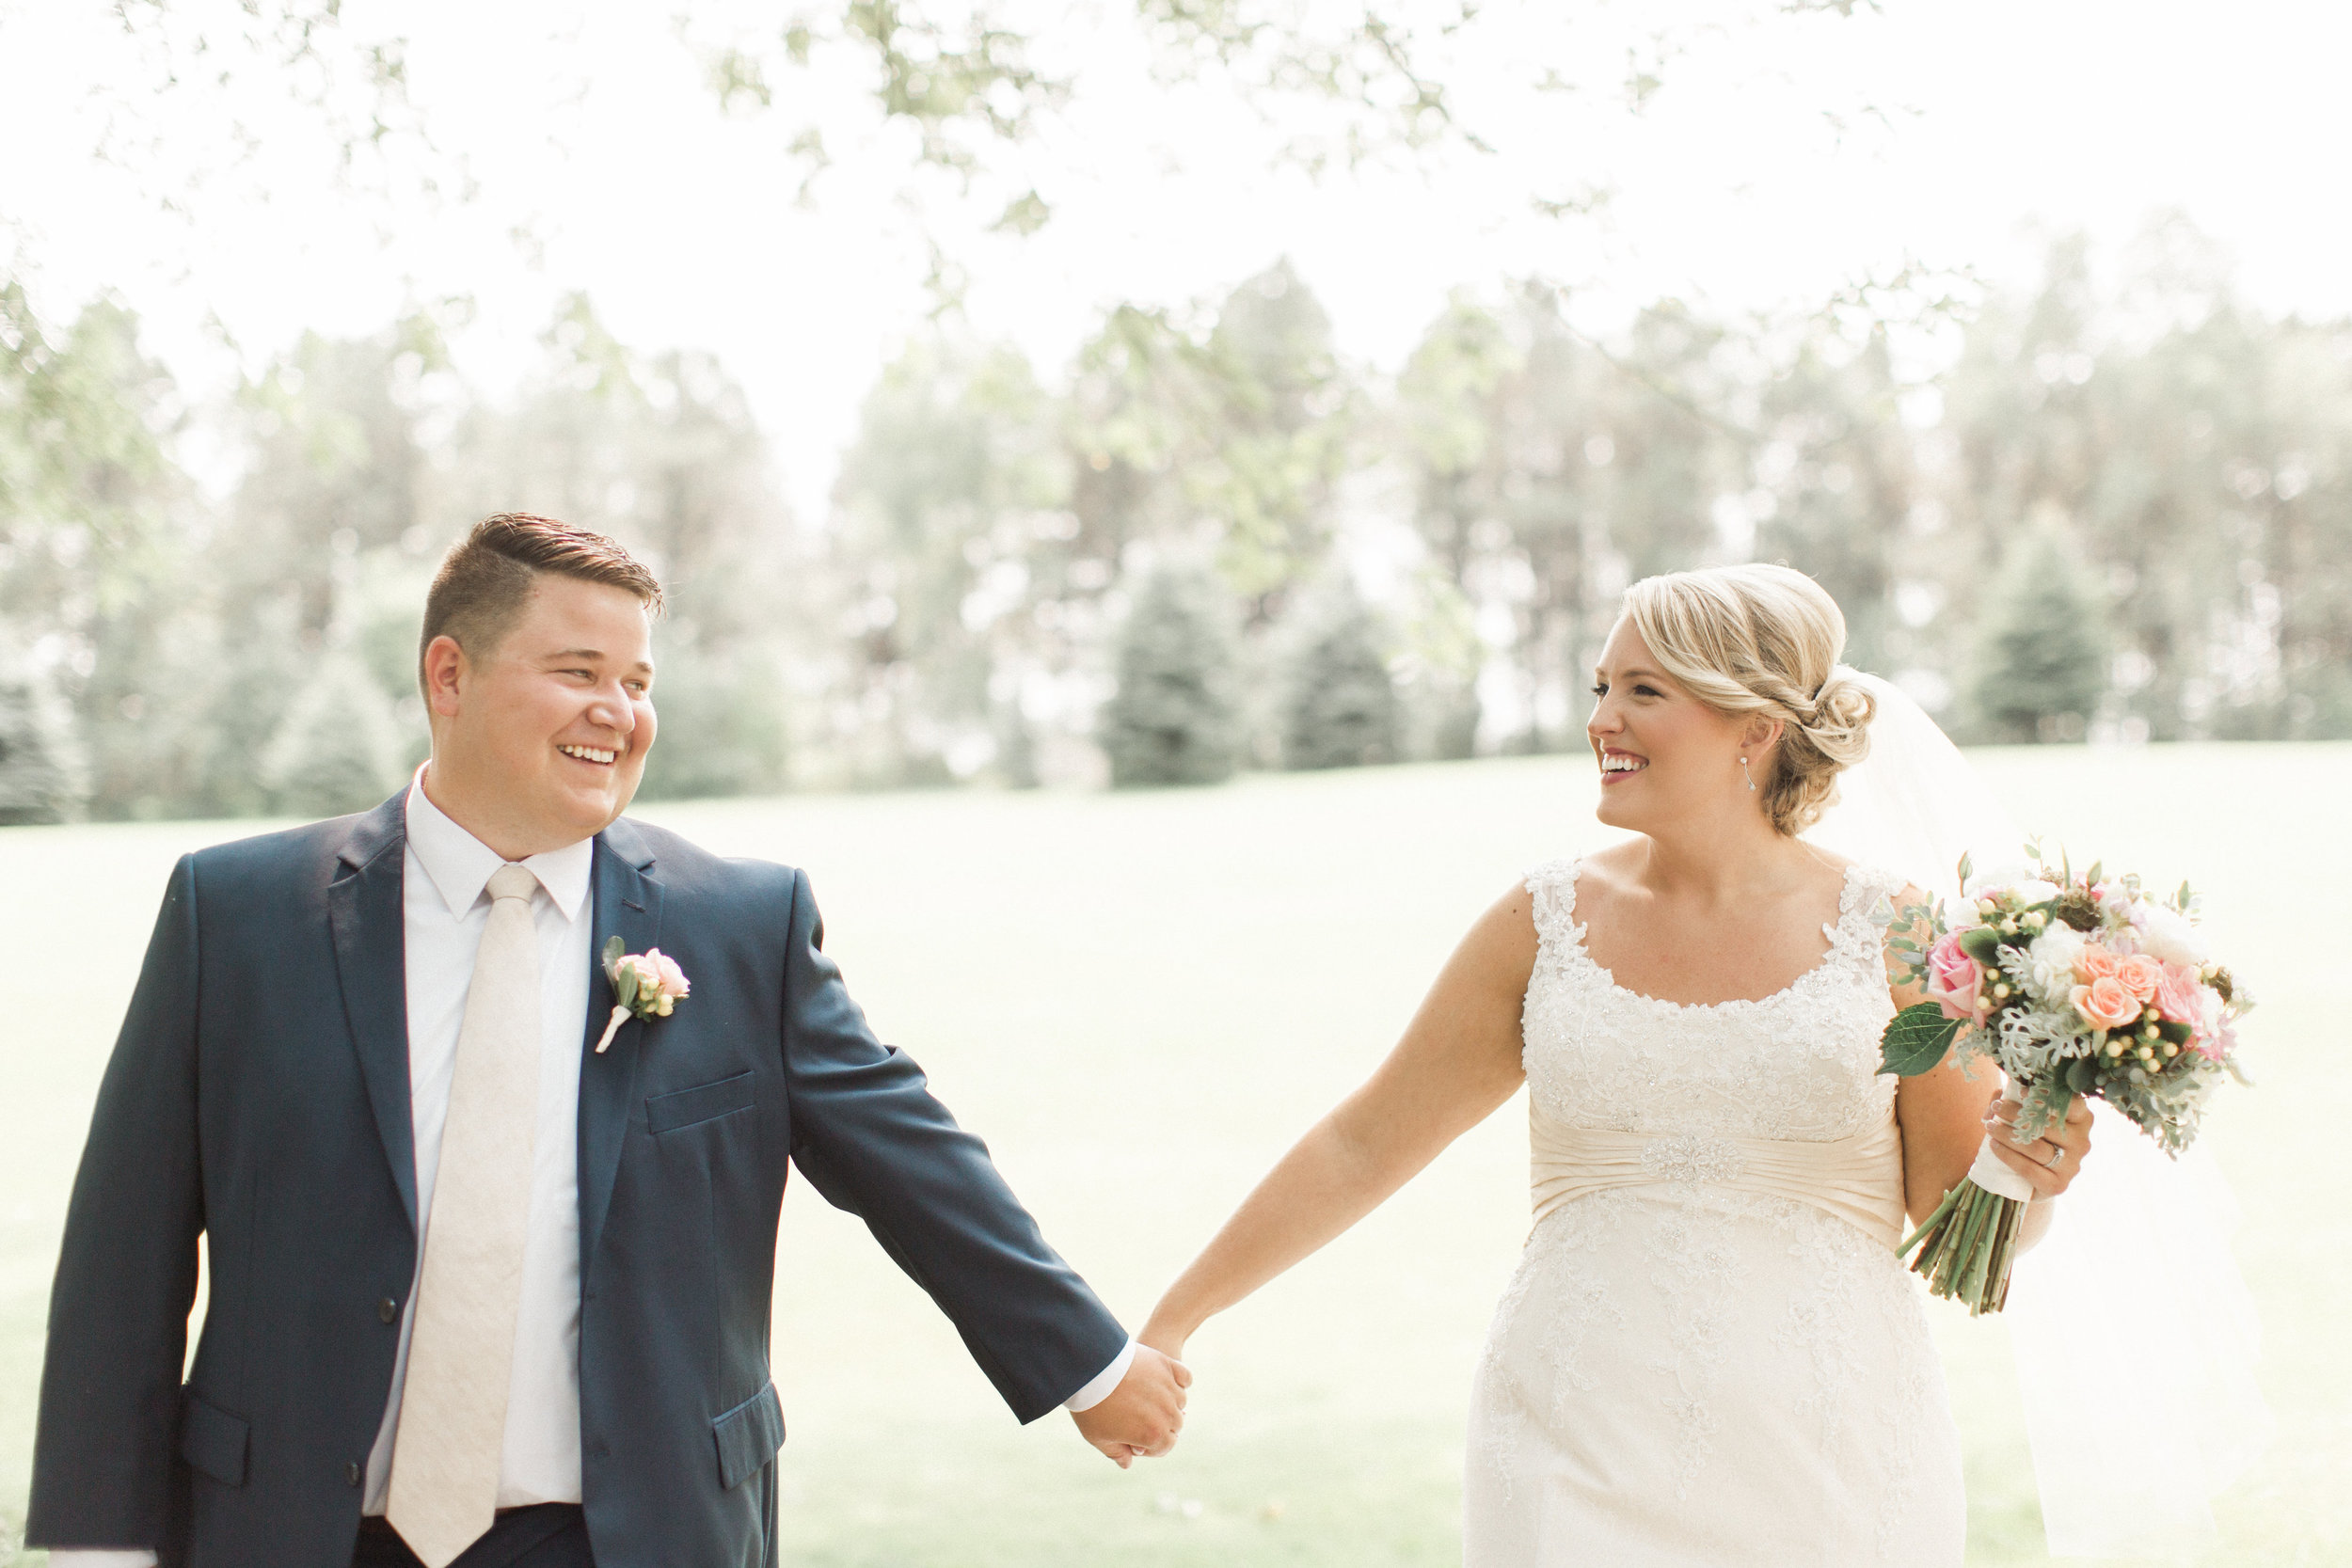 the Wedding-0152.jpg